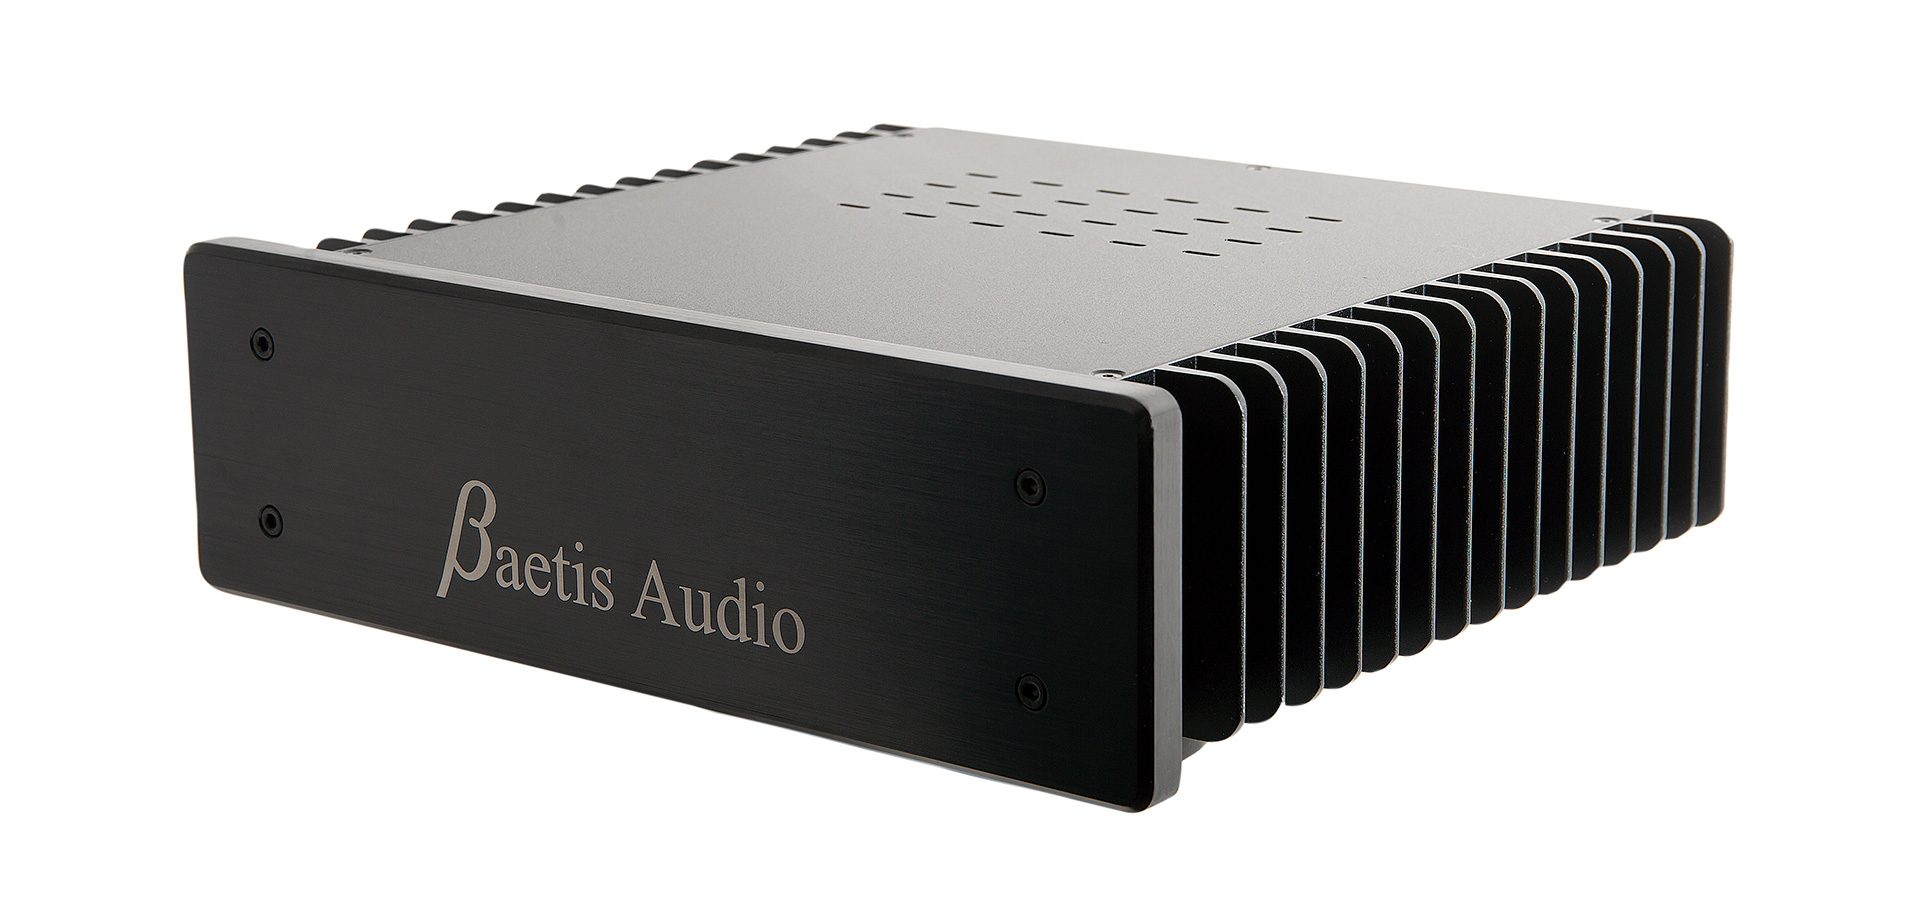 Review: Baetis Audio Revolution X3 Music Server